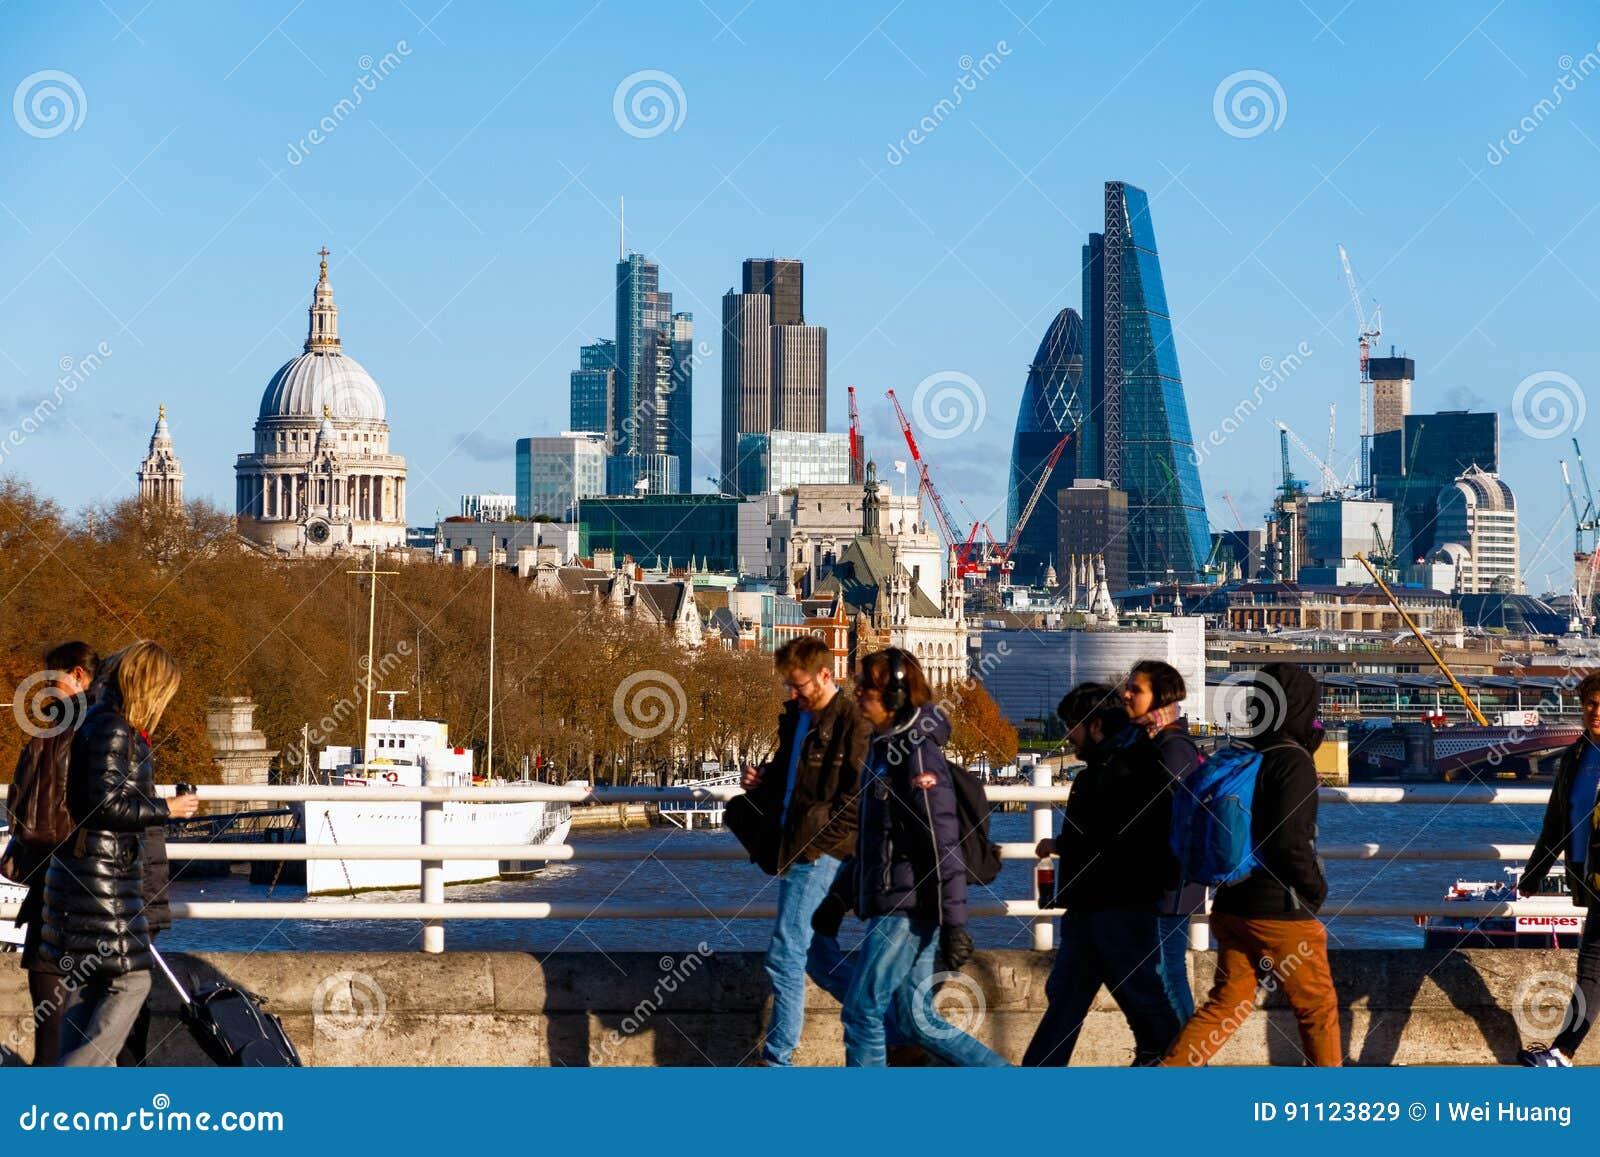 City of London seen from Waterloo Bridge